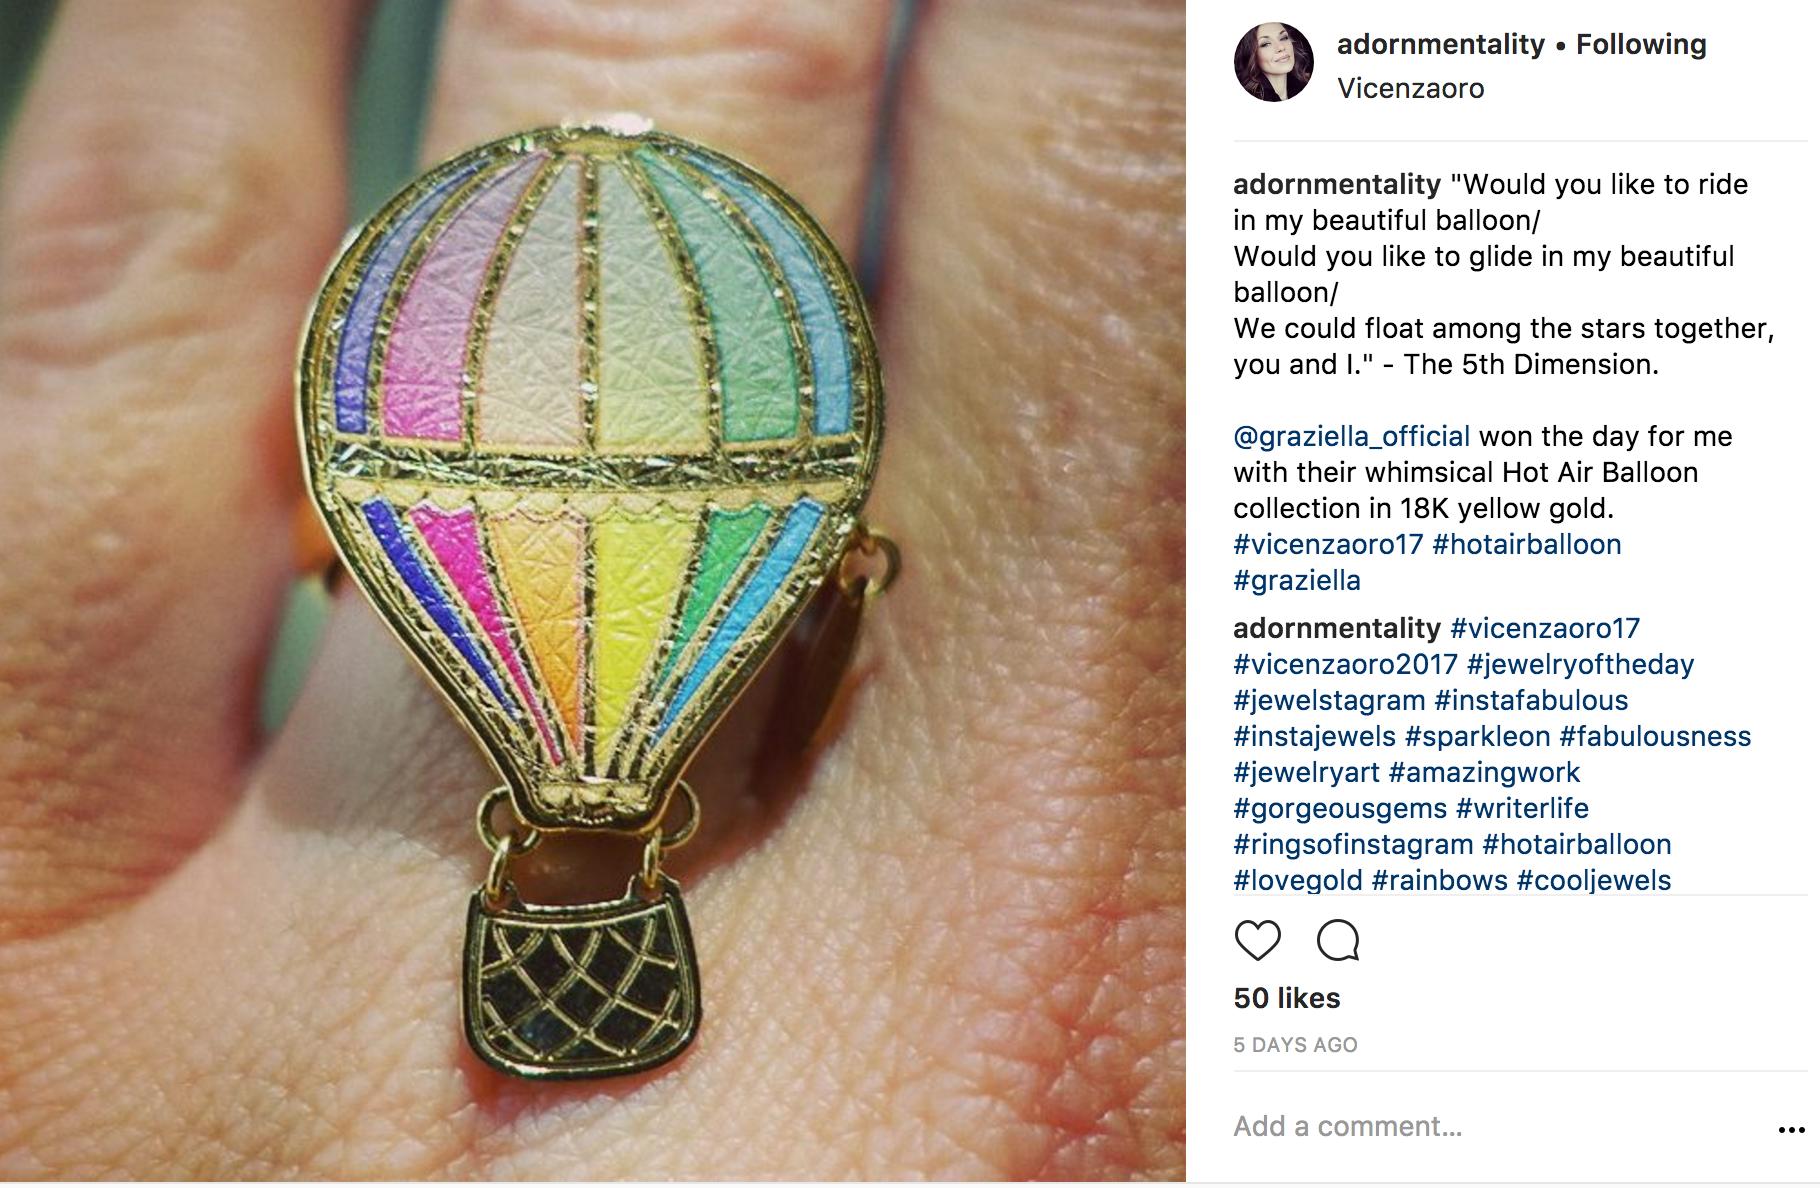 Adornmentality Instagram